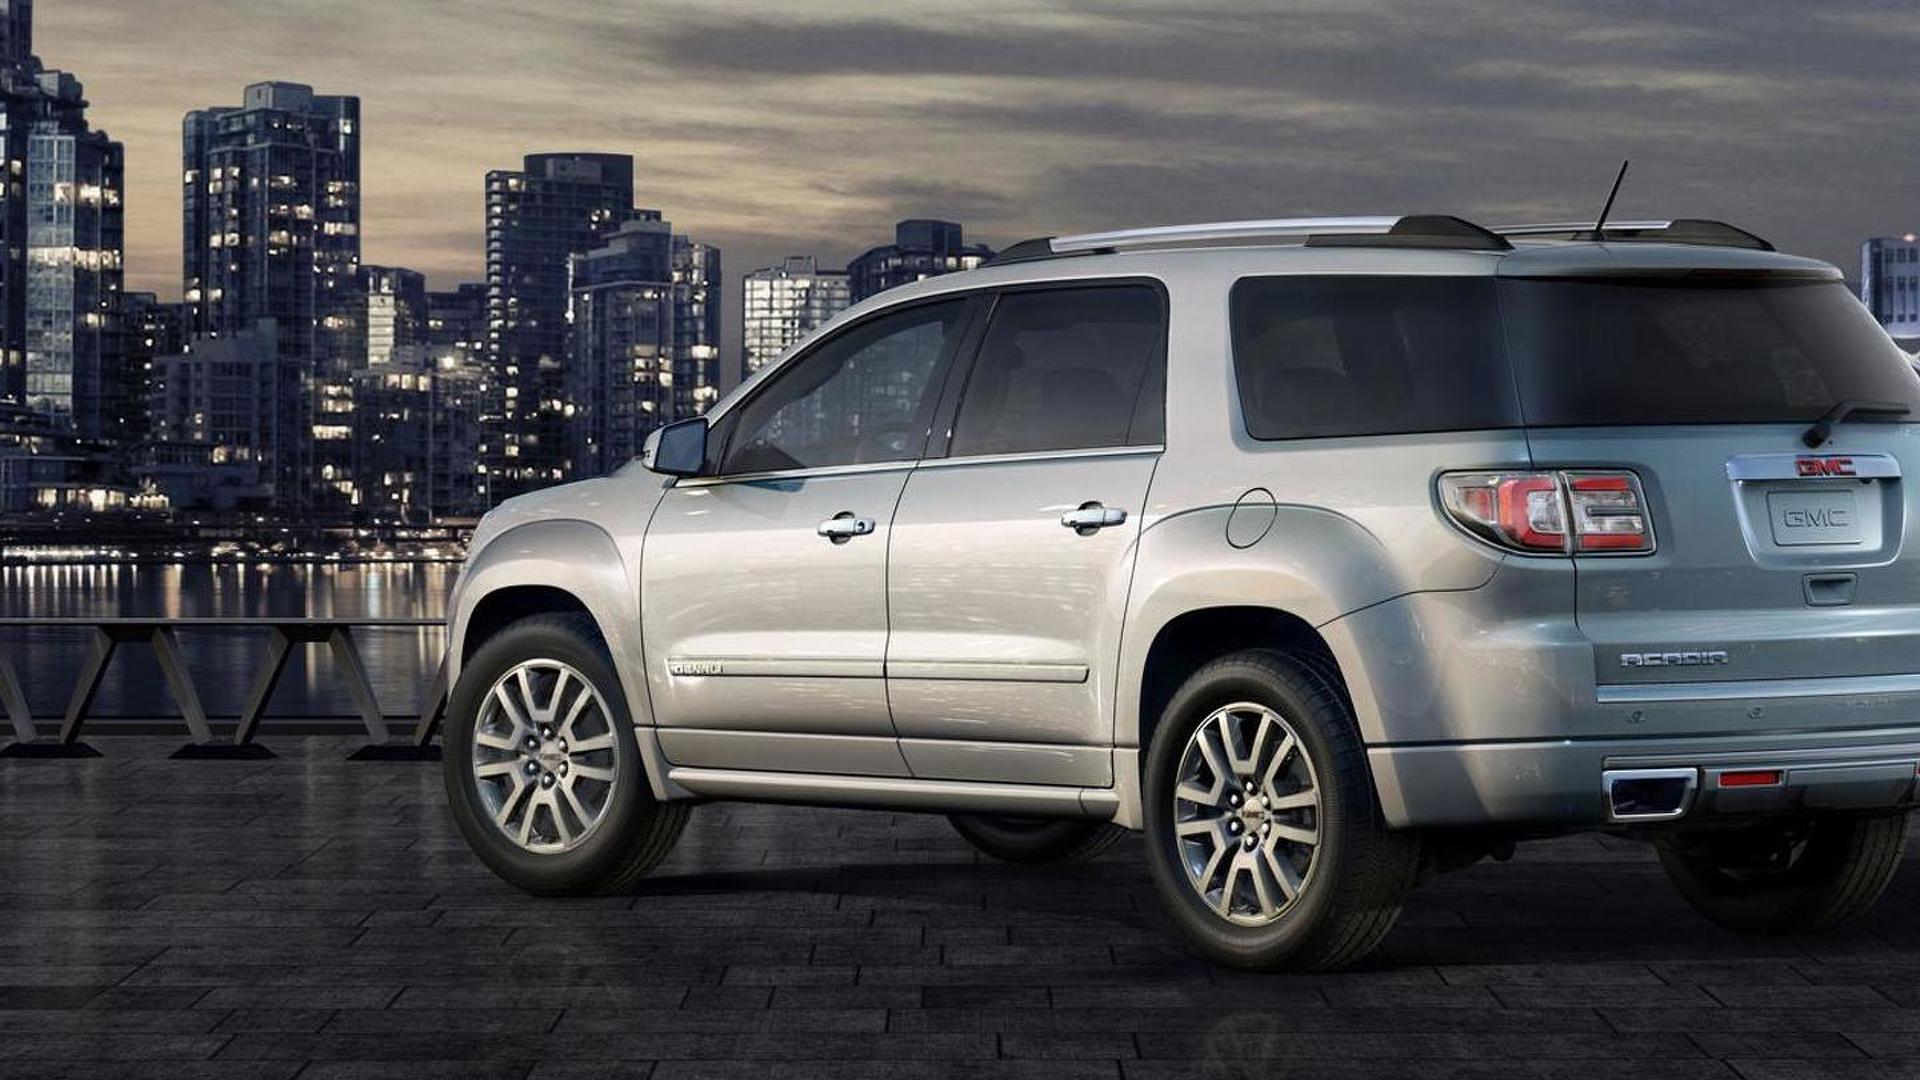 2013 GMC Acadia facelift debuts in Chicago